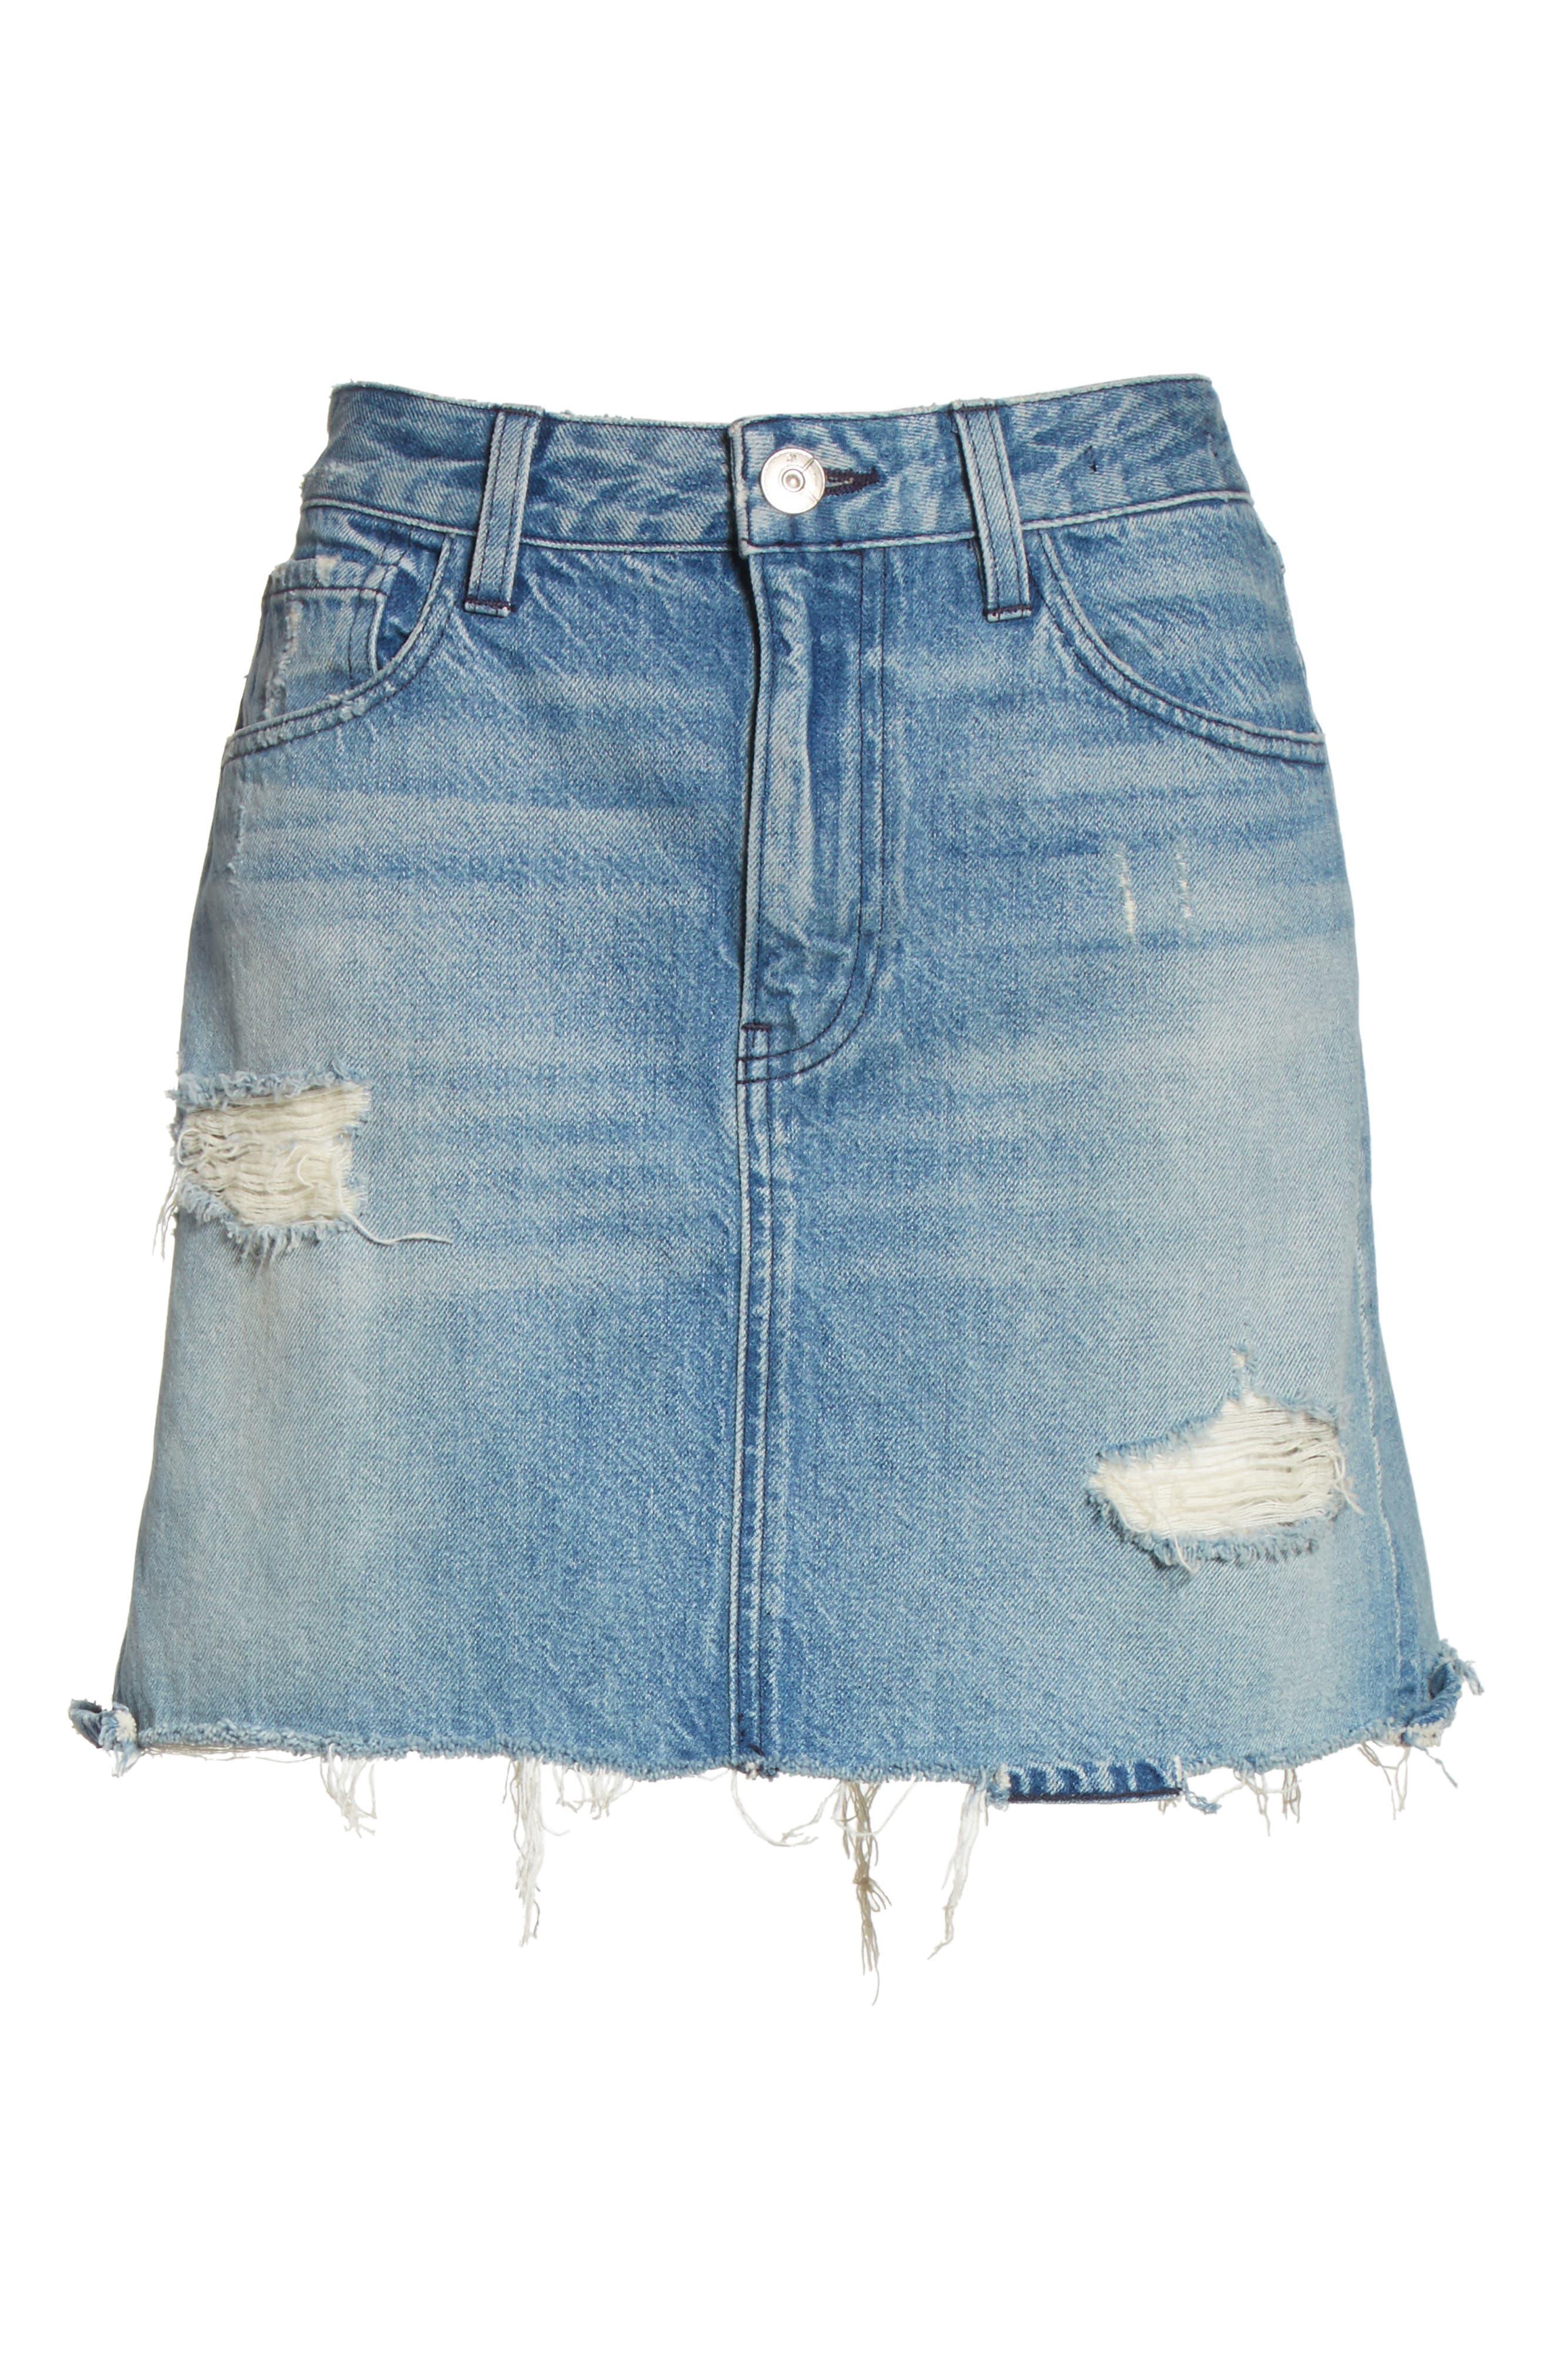 Celine Distressed Denim Skirt,                             Alternate thumbnail 6, color,                             Laz